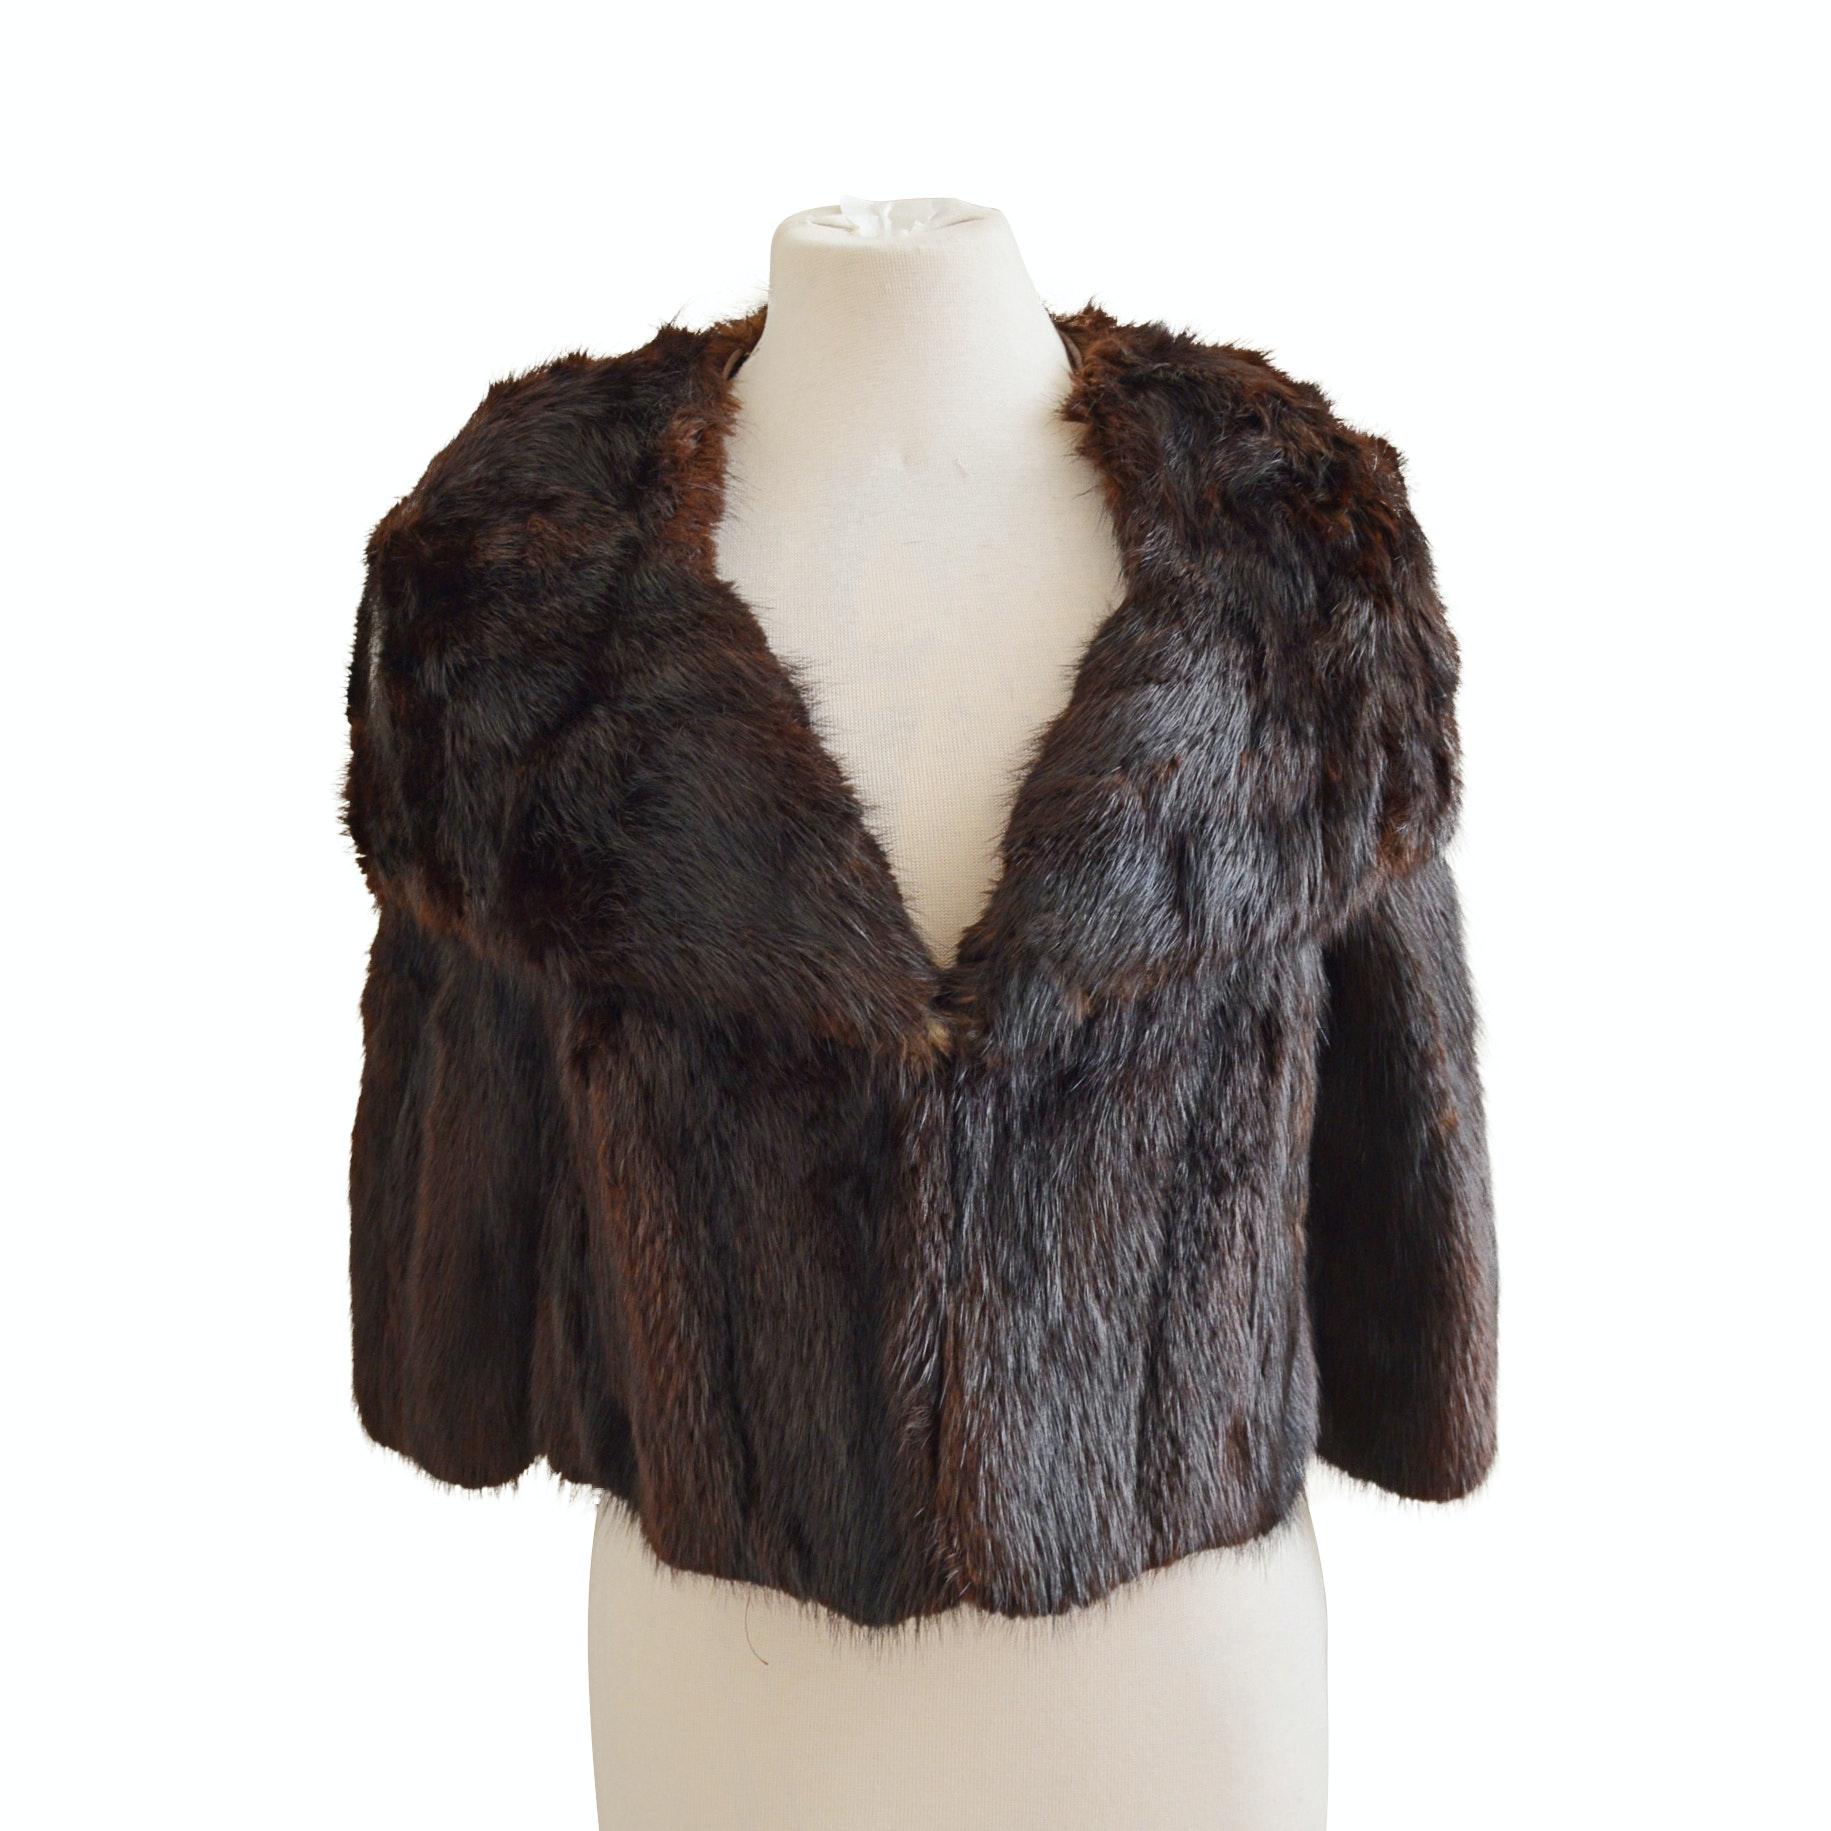 1940s-1950s Vintage Dyed Marten Fur Capelet